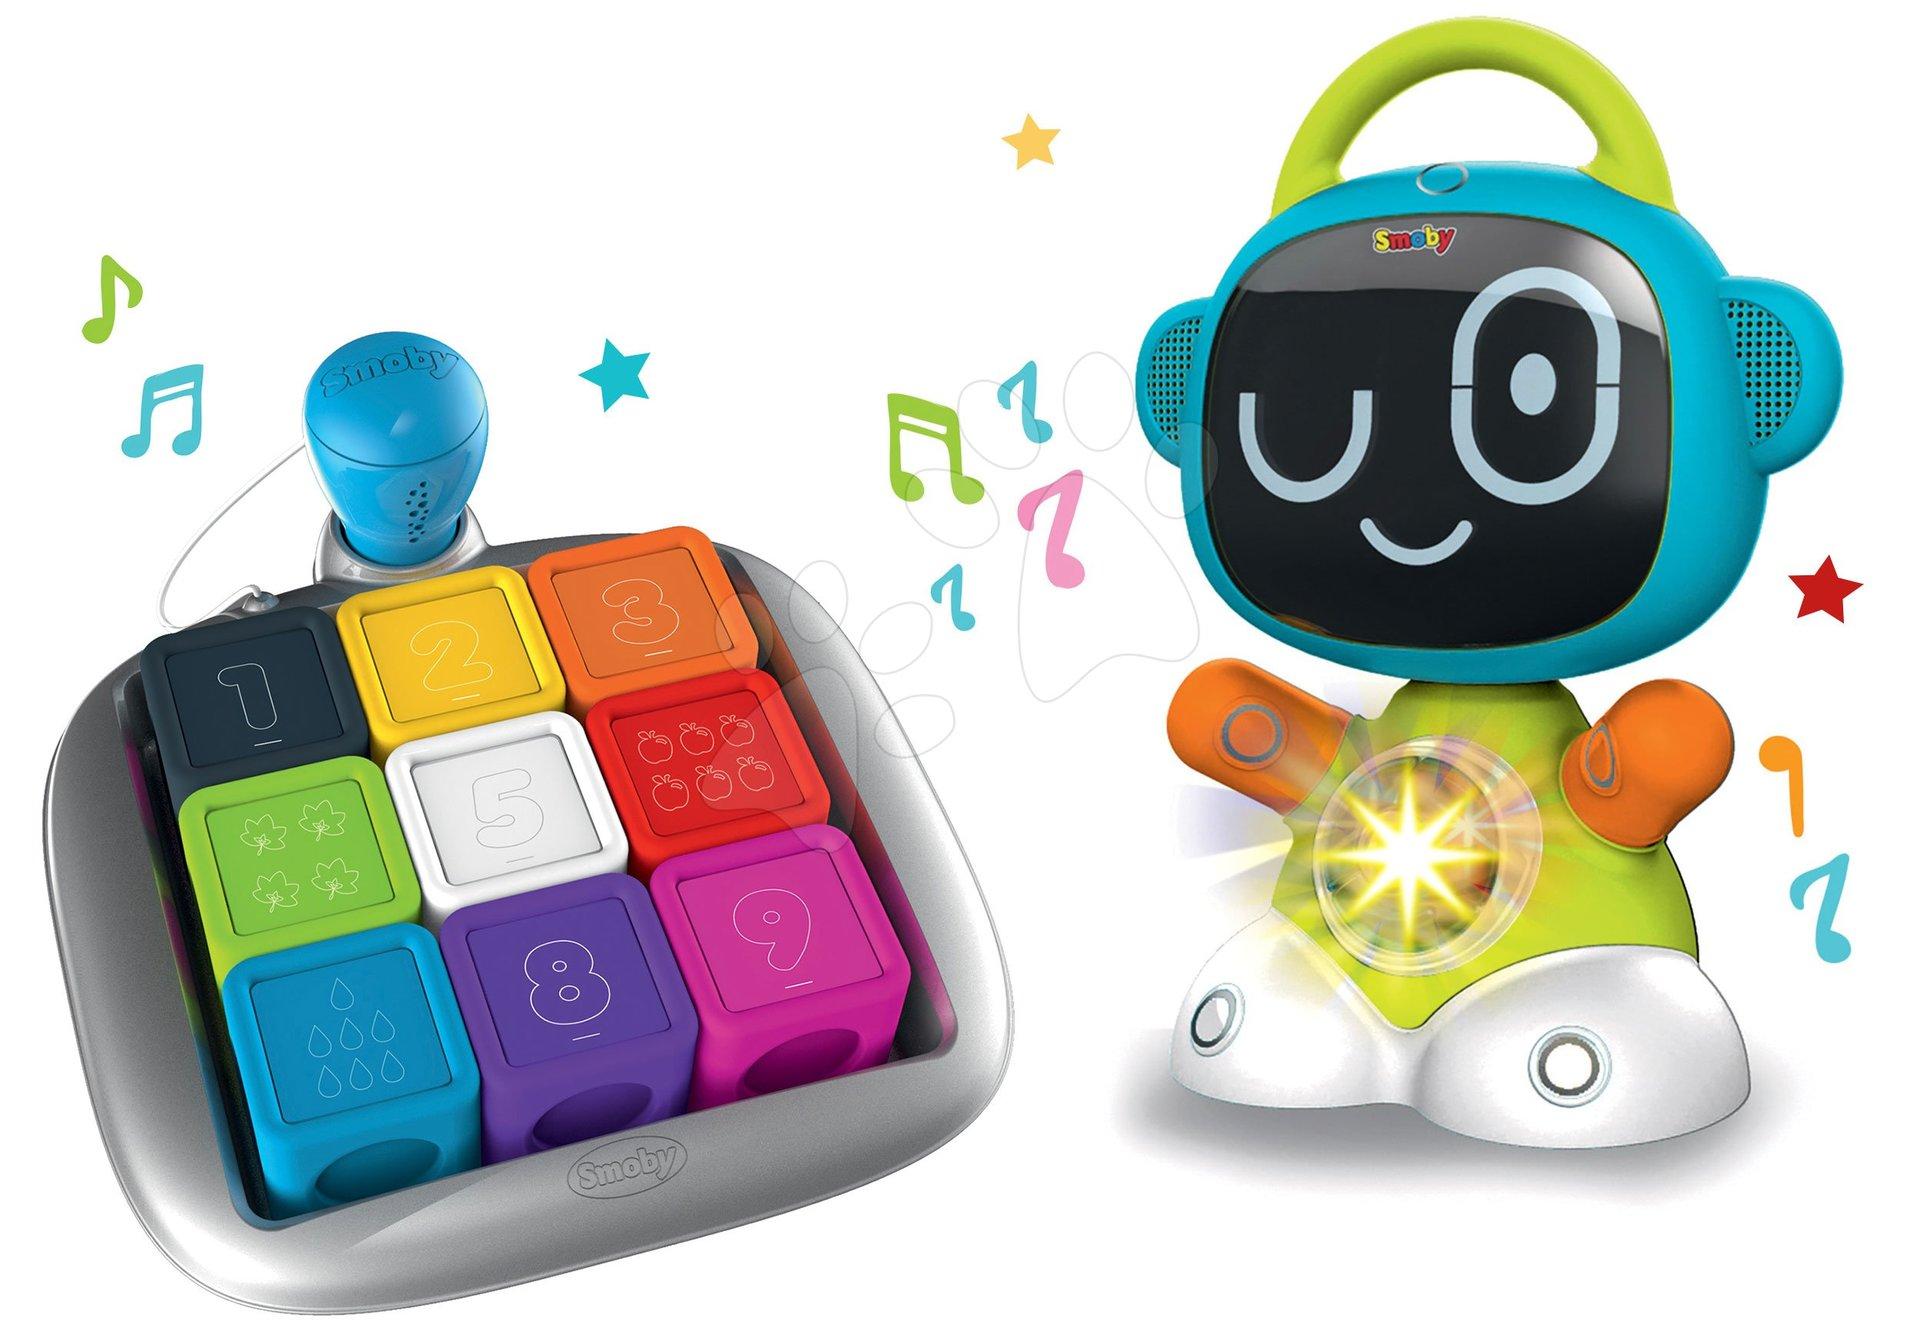 Set interaktivní Robot TIC Smart Smoby s 3 naučnými hrami a chytrá hra kostky